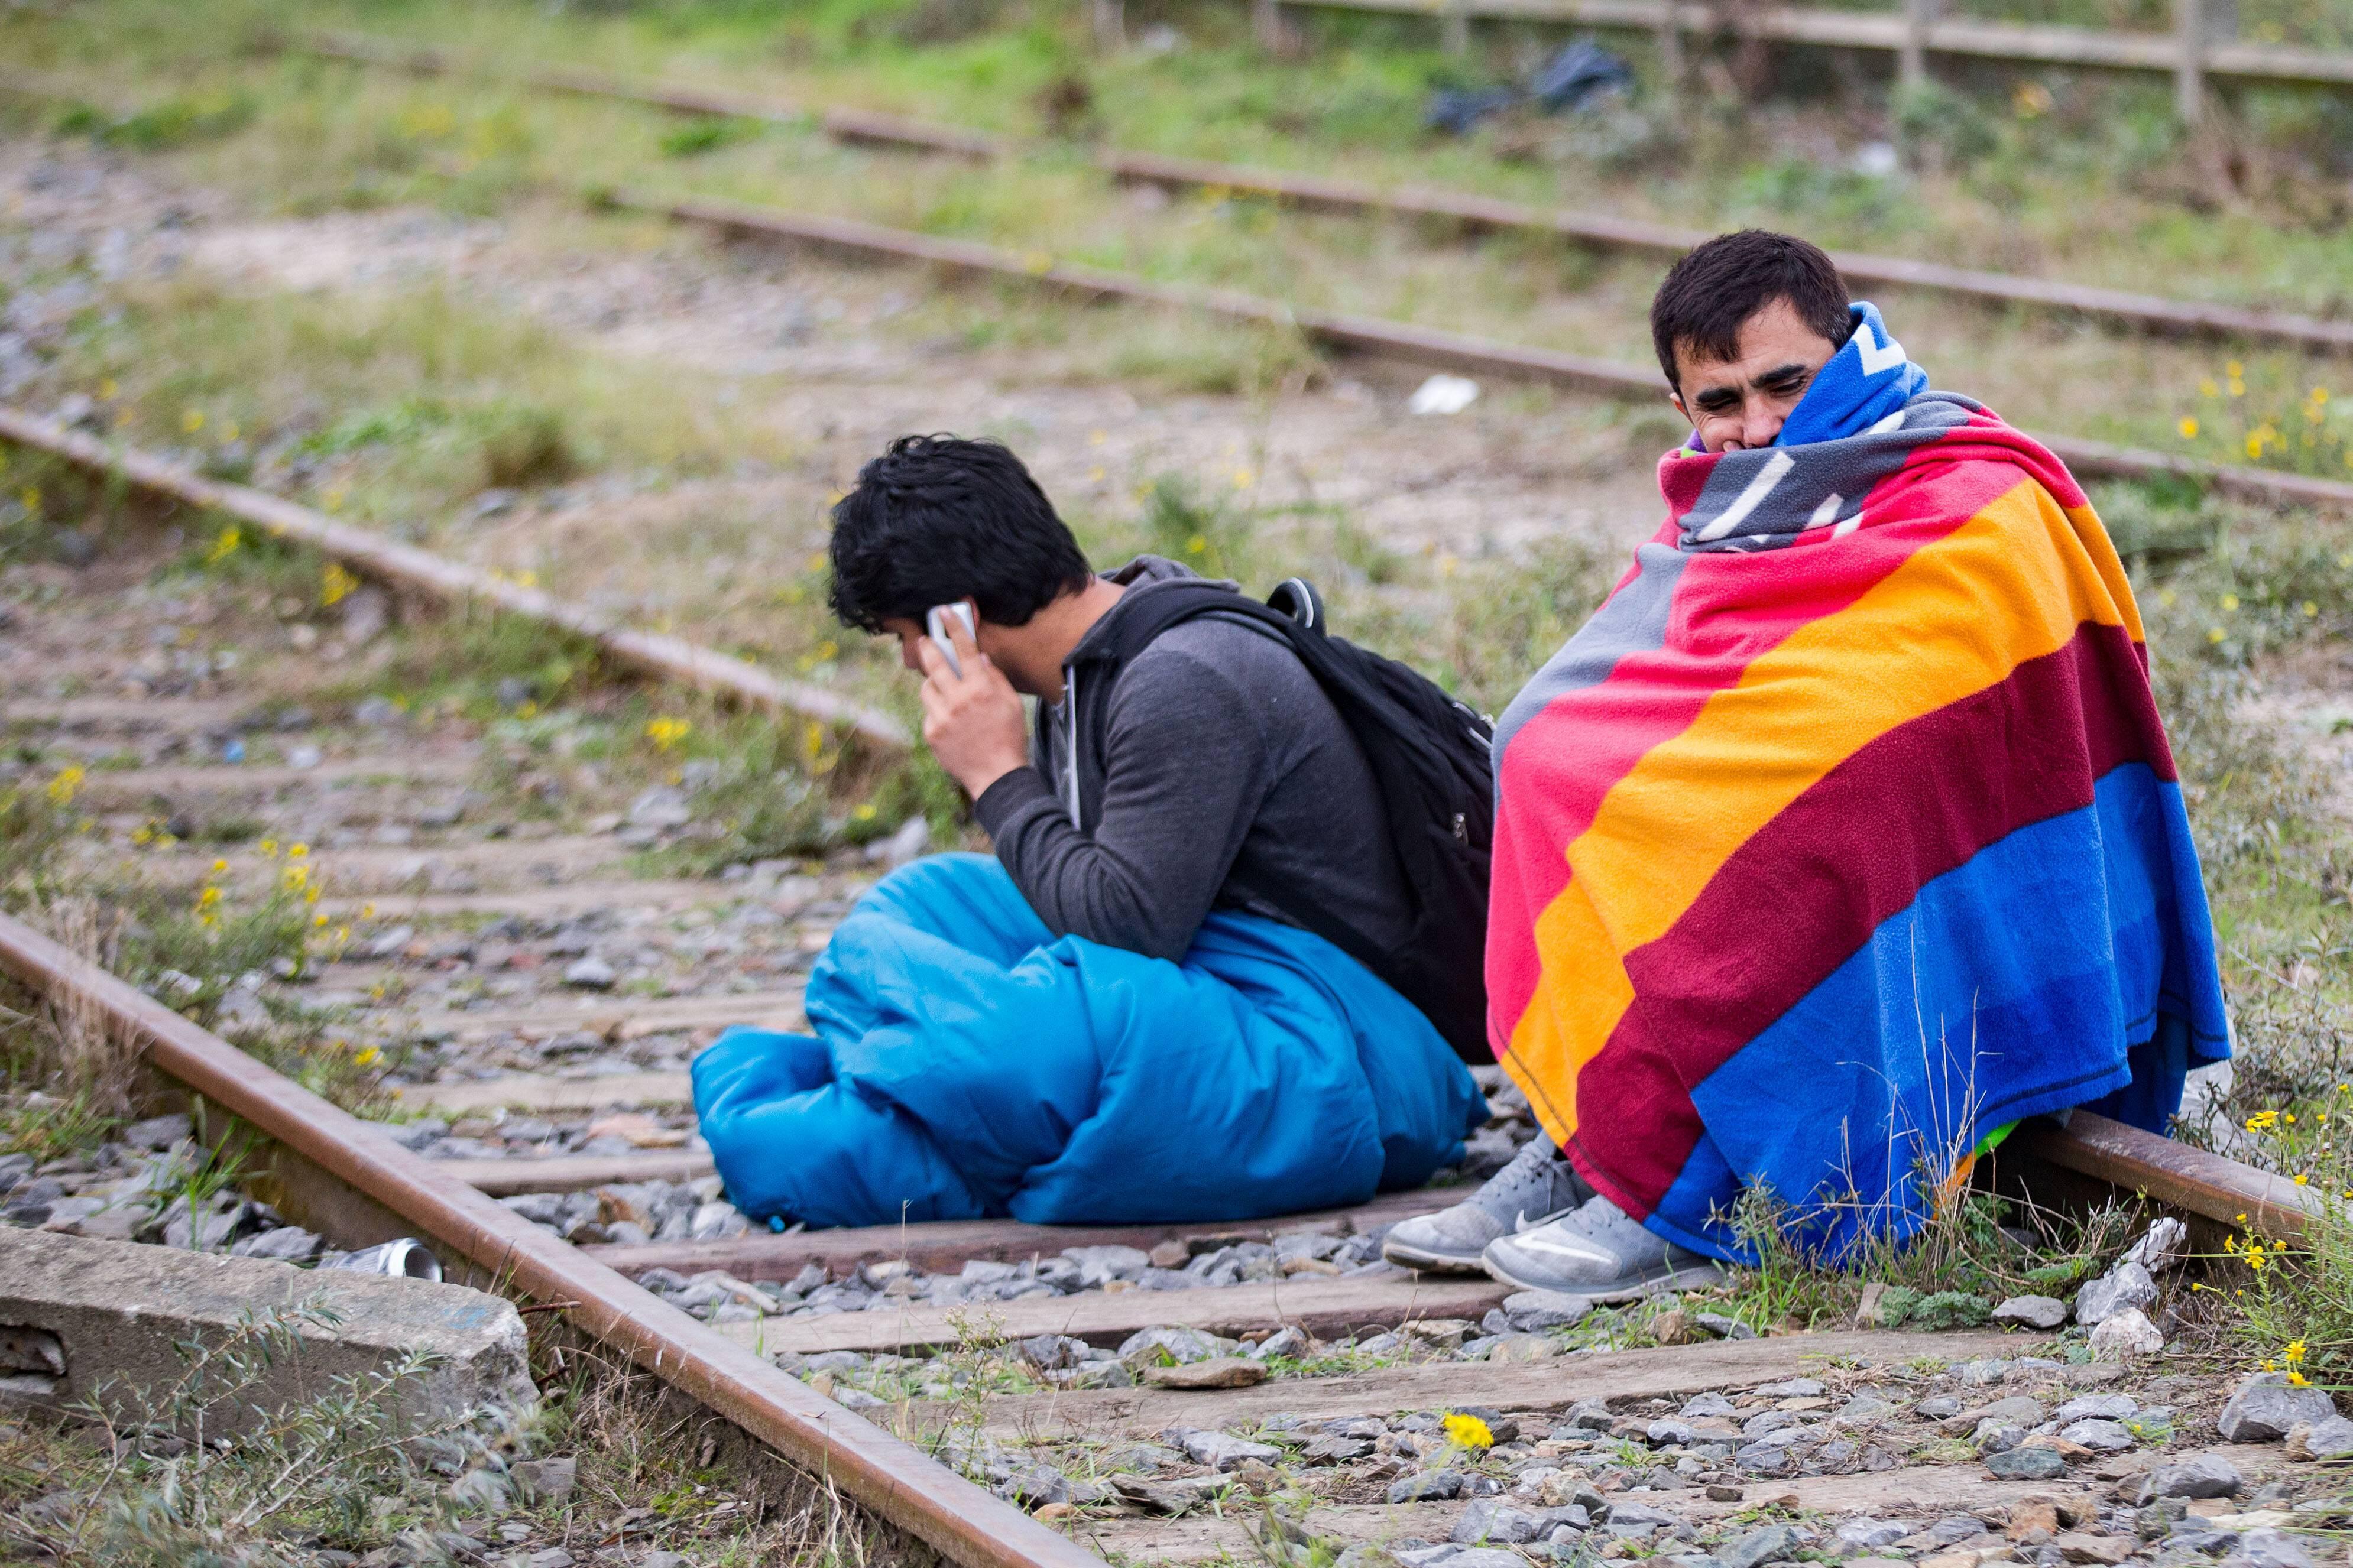 Bild zu Calais, Flüchtlinge, Eurotunnel